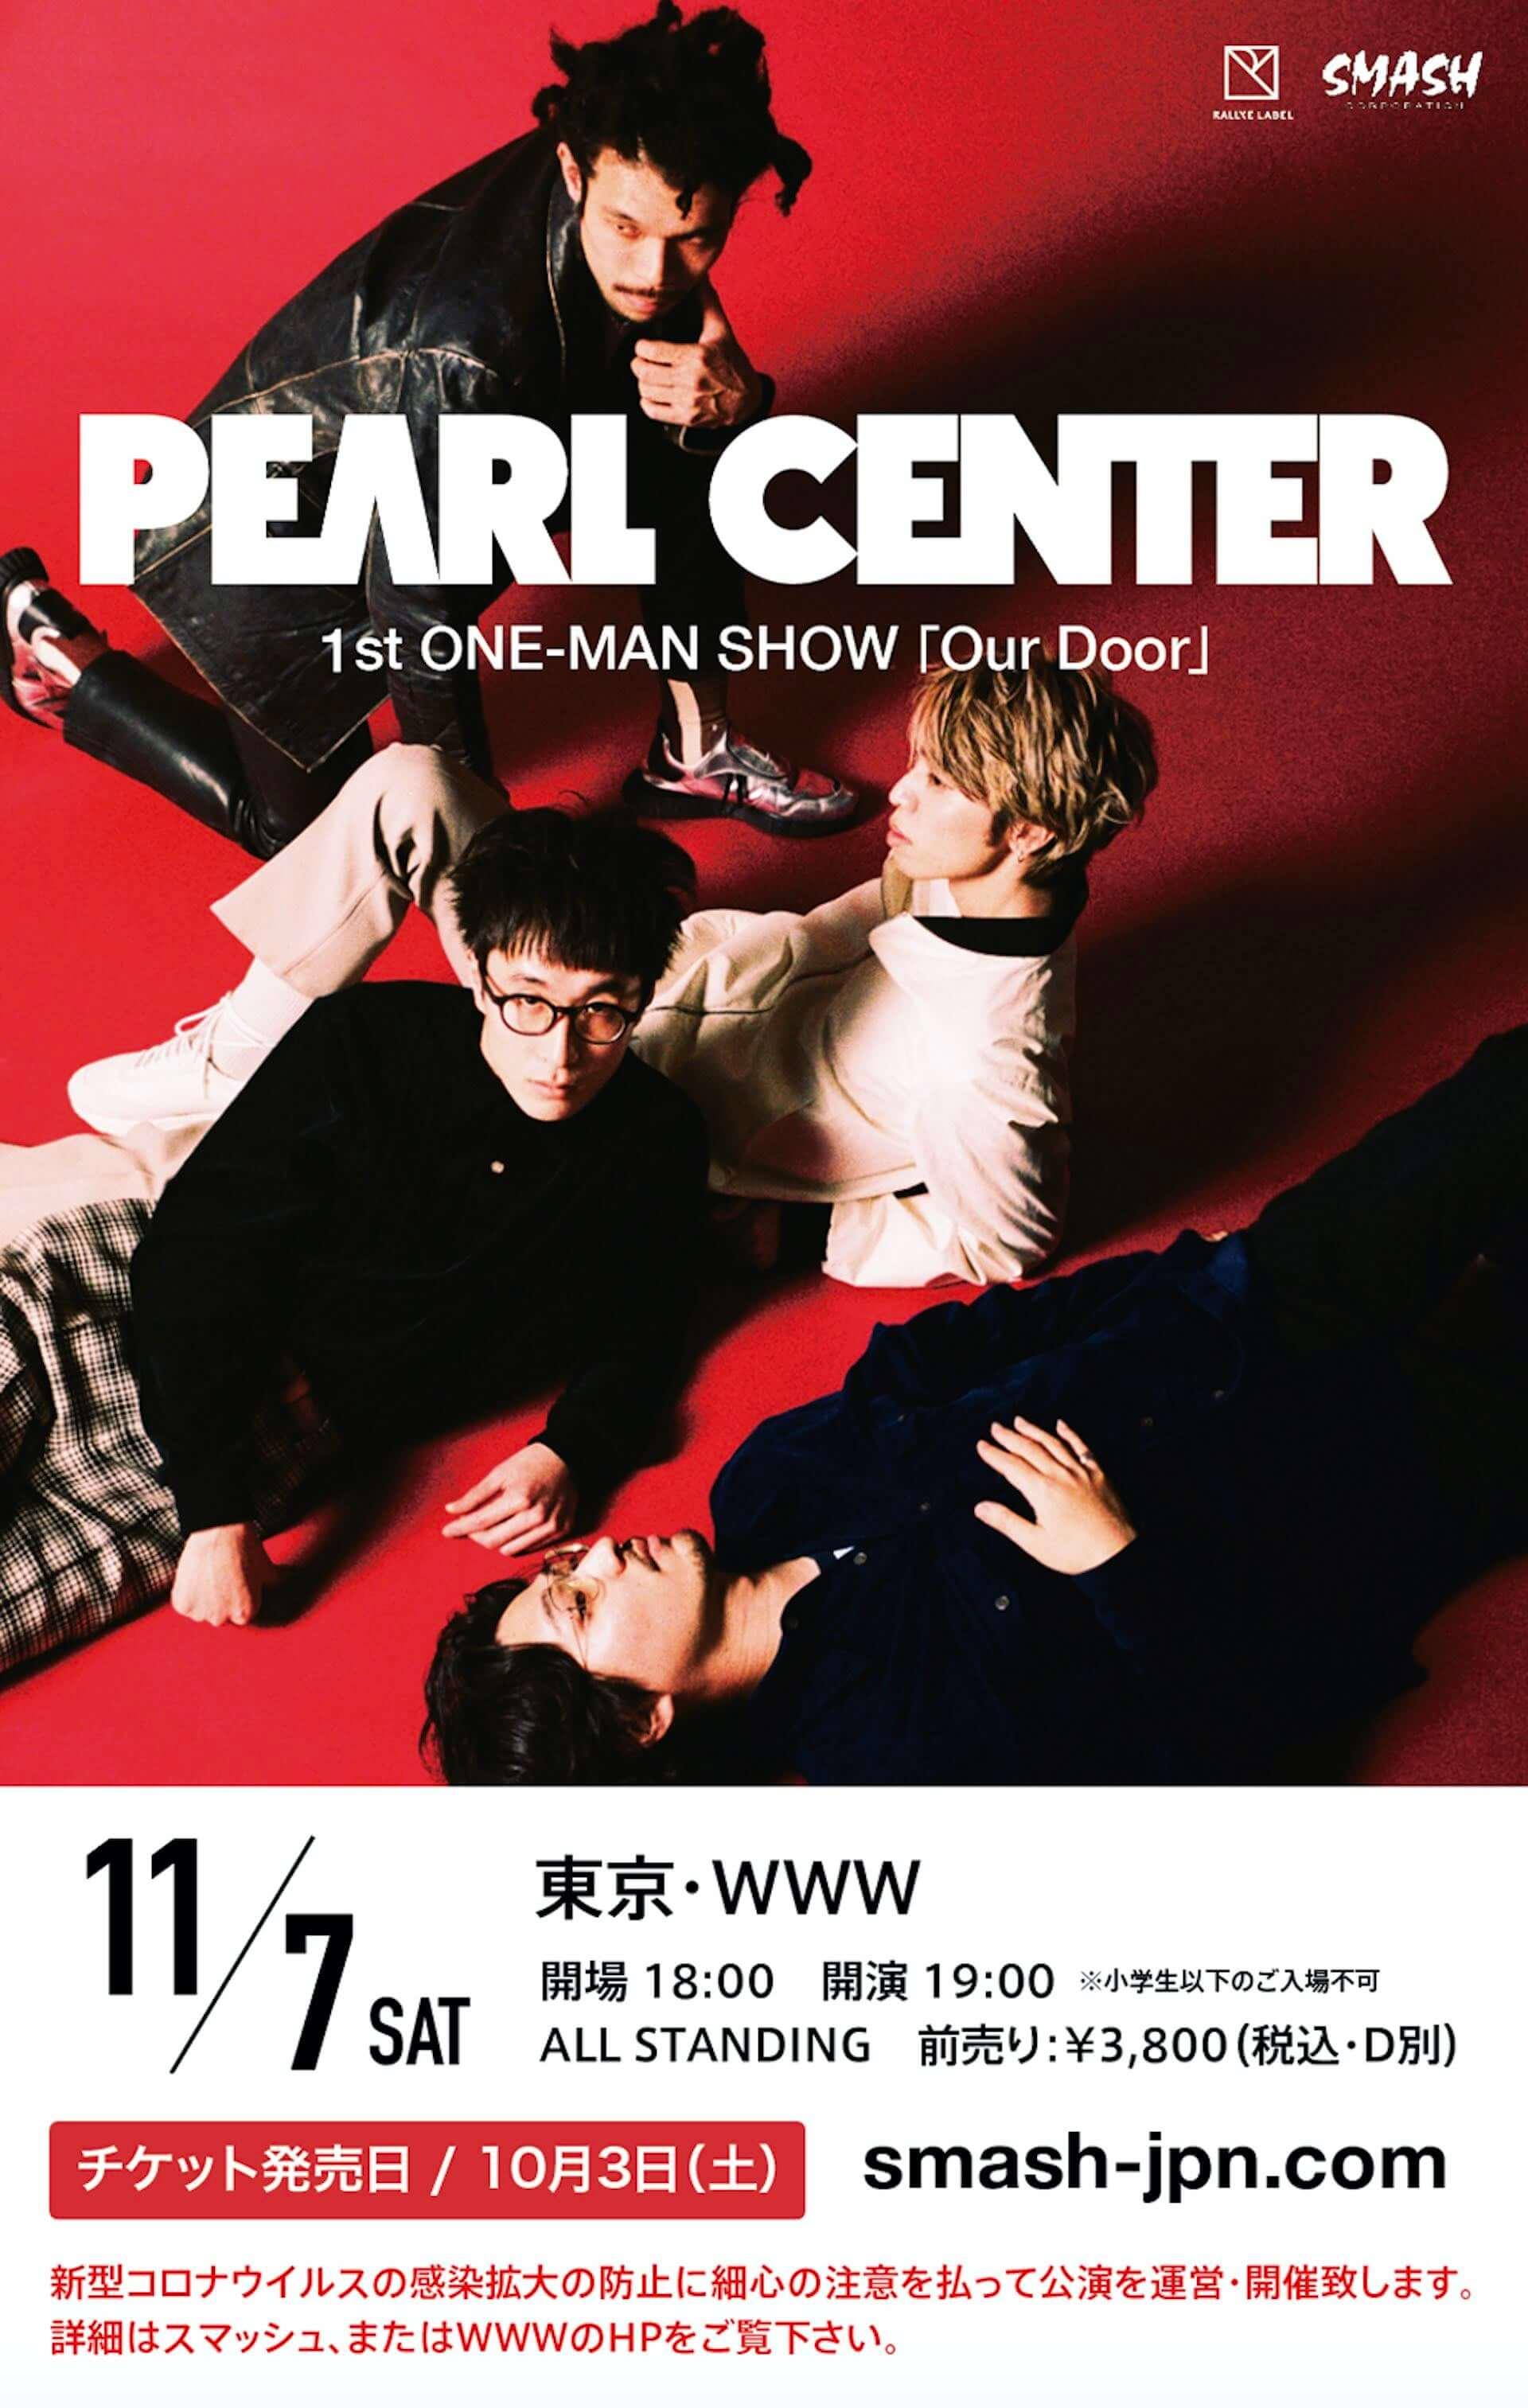 PEARL CENTER初のワンマンライブが渋谷WWWにて開催決定!高橋健介、越智俊介、近藤邦彦も参加 music201001_pearlcenter_2-1920x3026